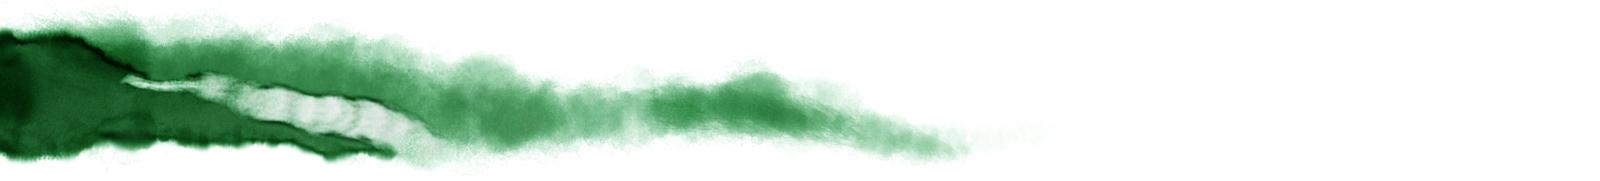 Muse-Green-Watercolor.jpg